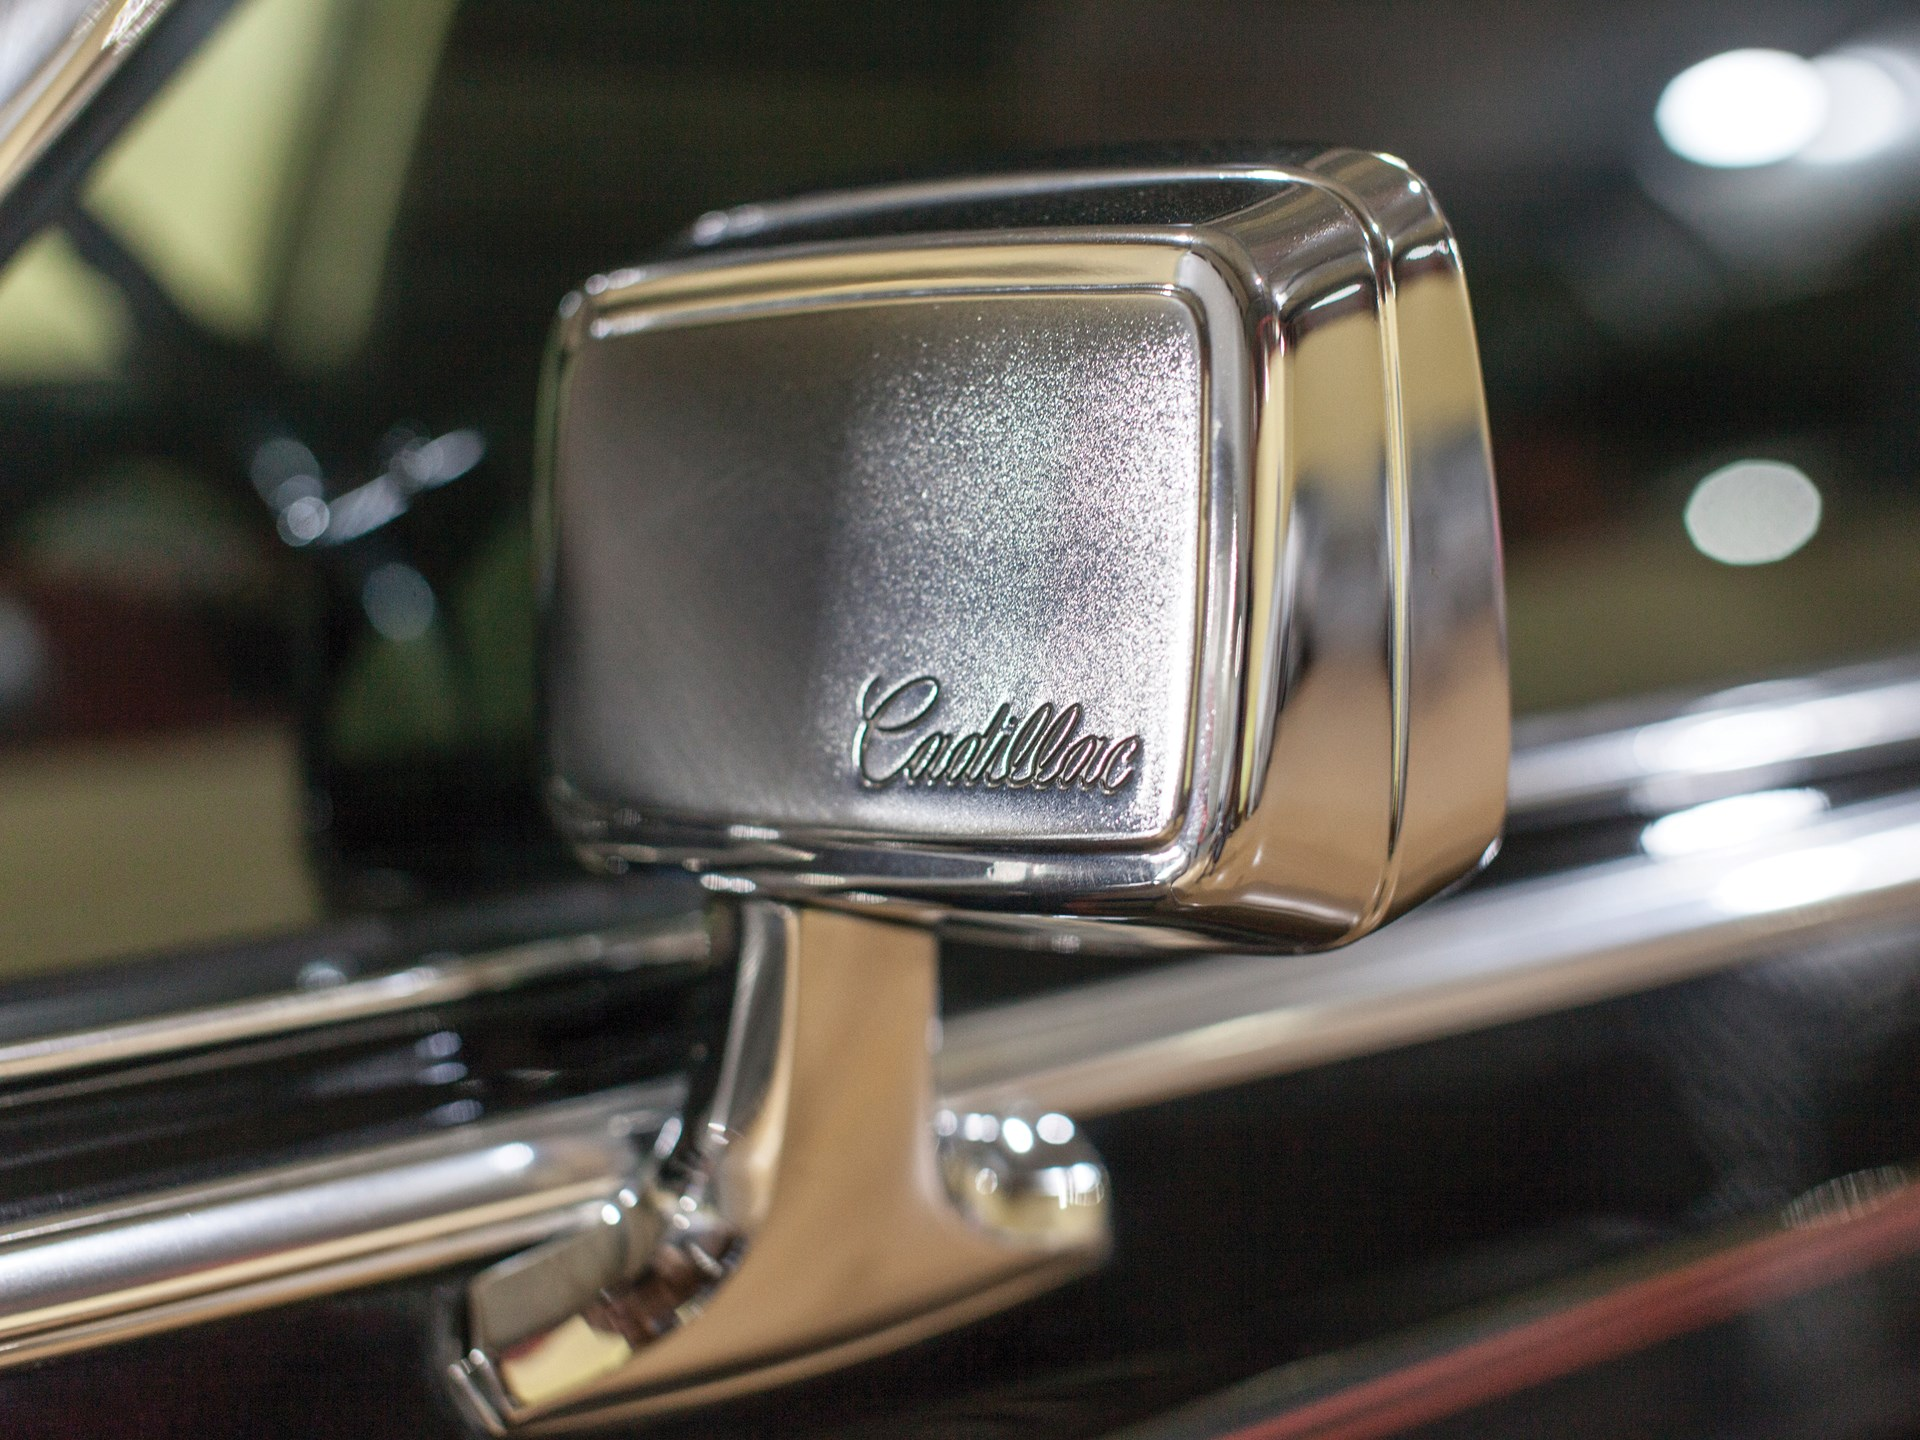 1990 Cadillac Brougham Limousine